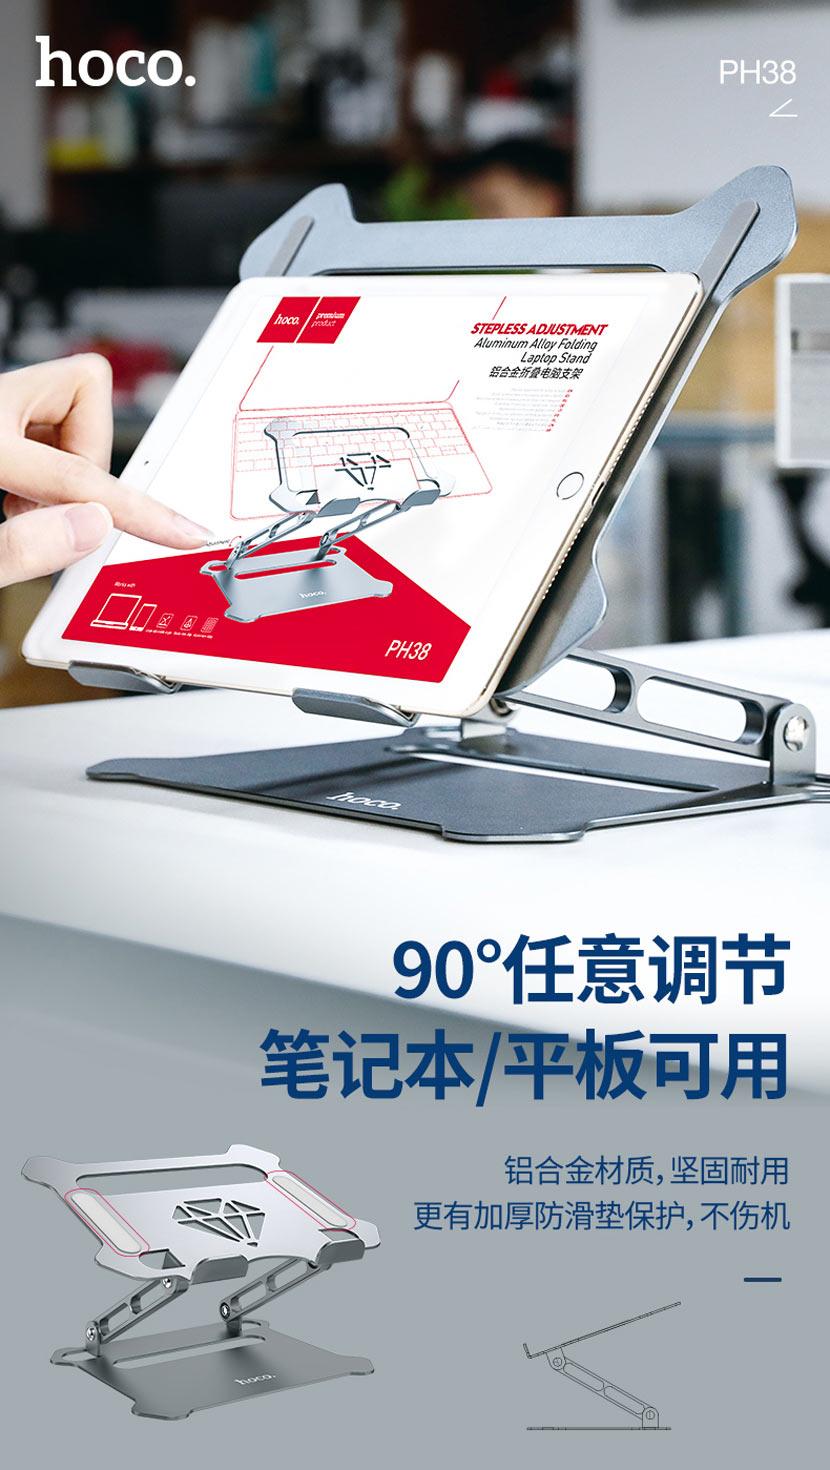 hoco ph38 diamond aluminum alloy folding laptop stand adjustment cn